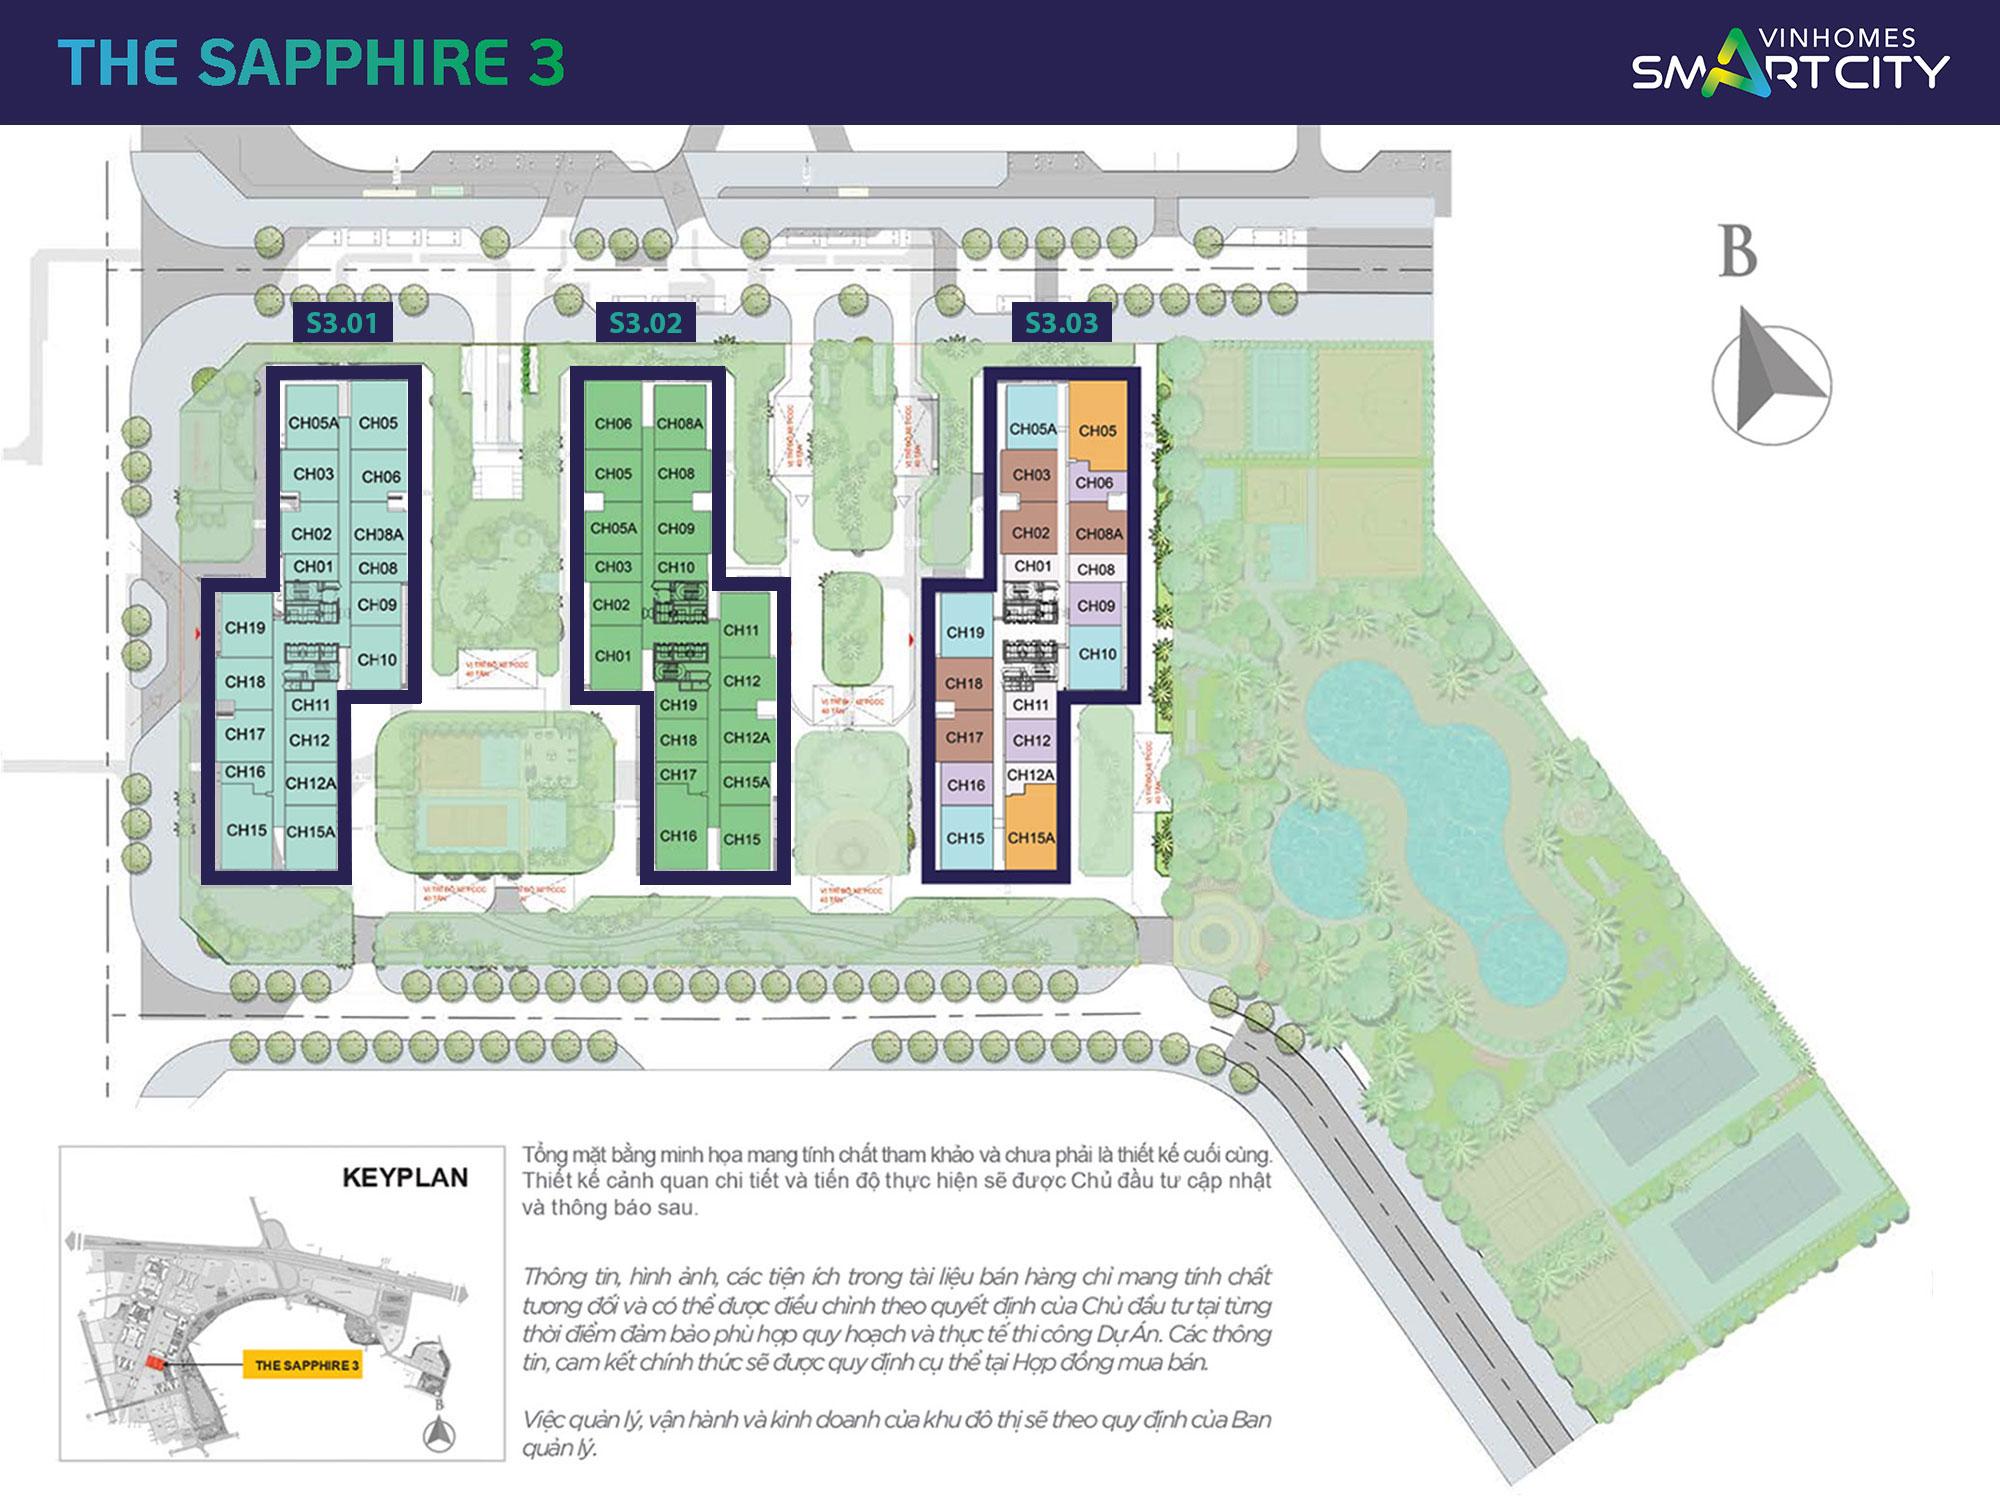 mat-bang-phan-khu-the-sapphire-3-vinhomes-smart-city